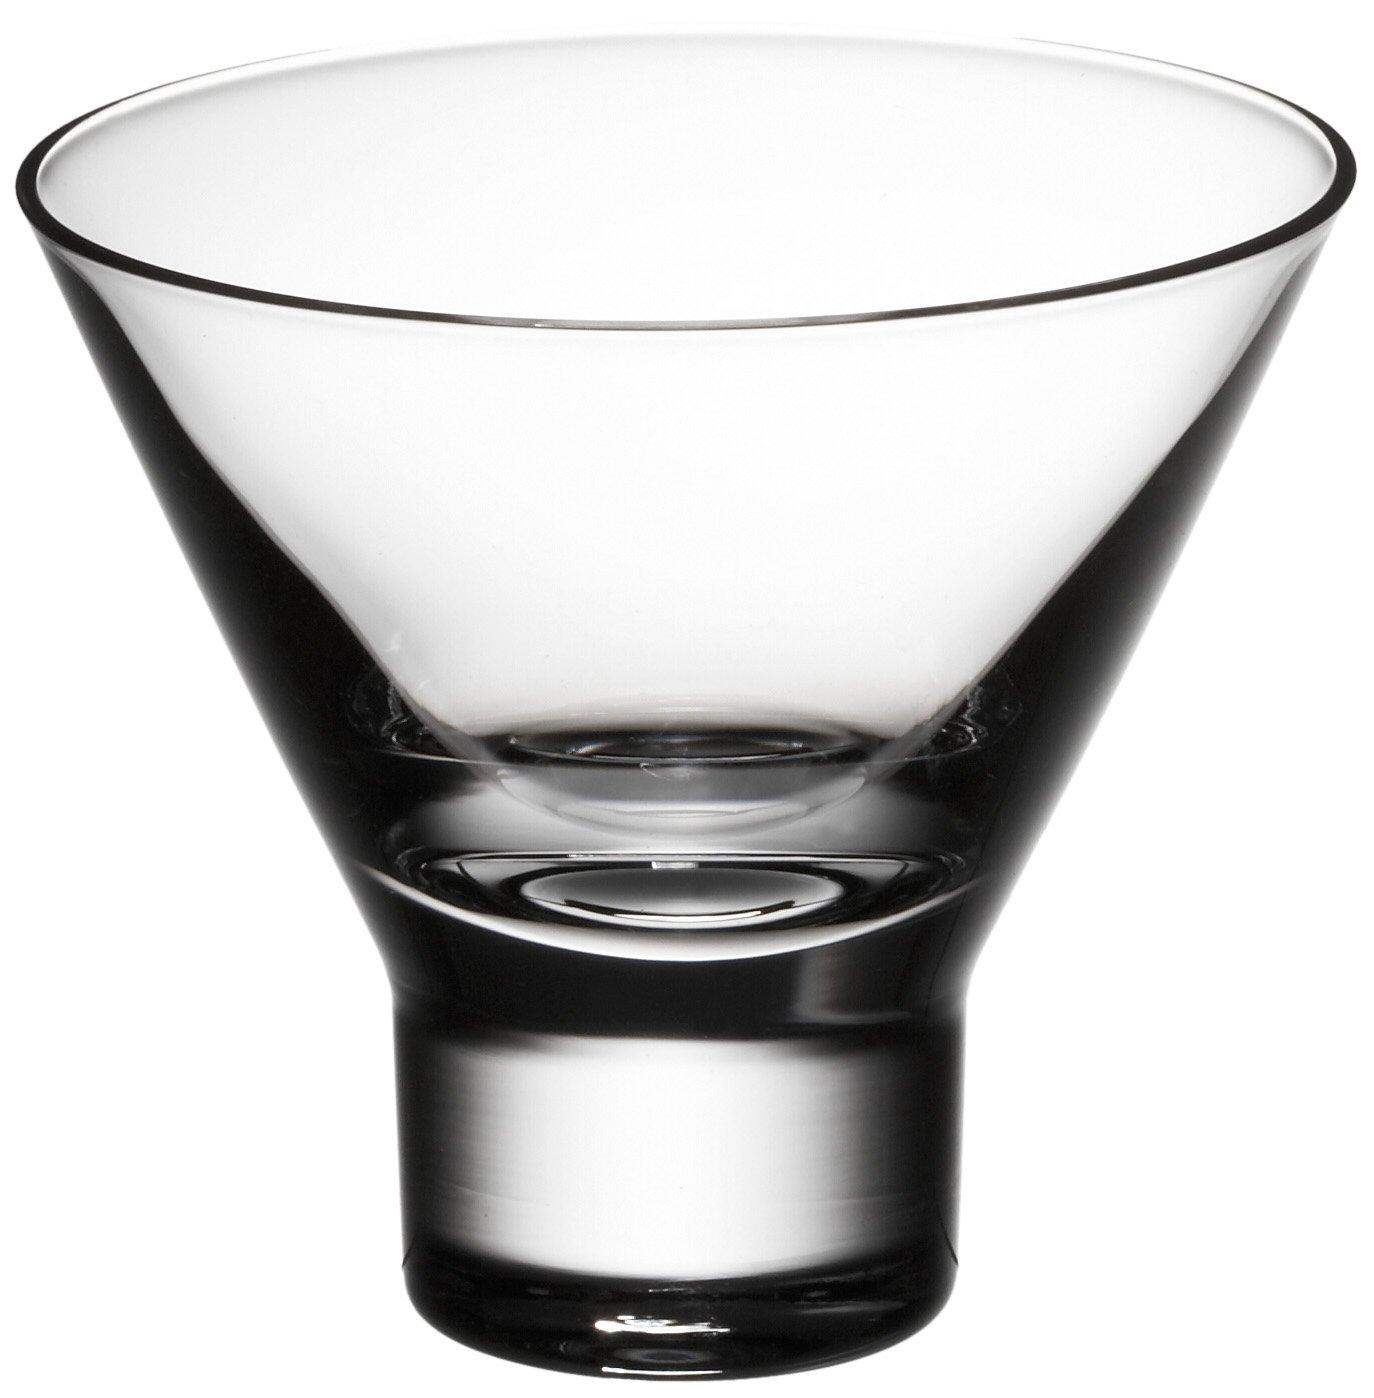 Iittala Aarne Cocktail Glasses, Set of 2 by Iittala